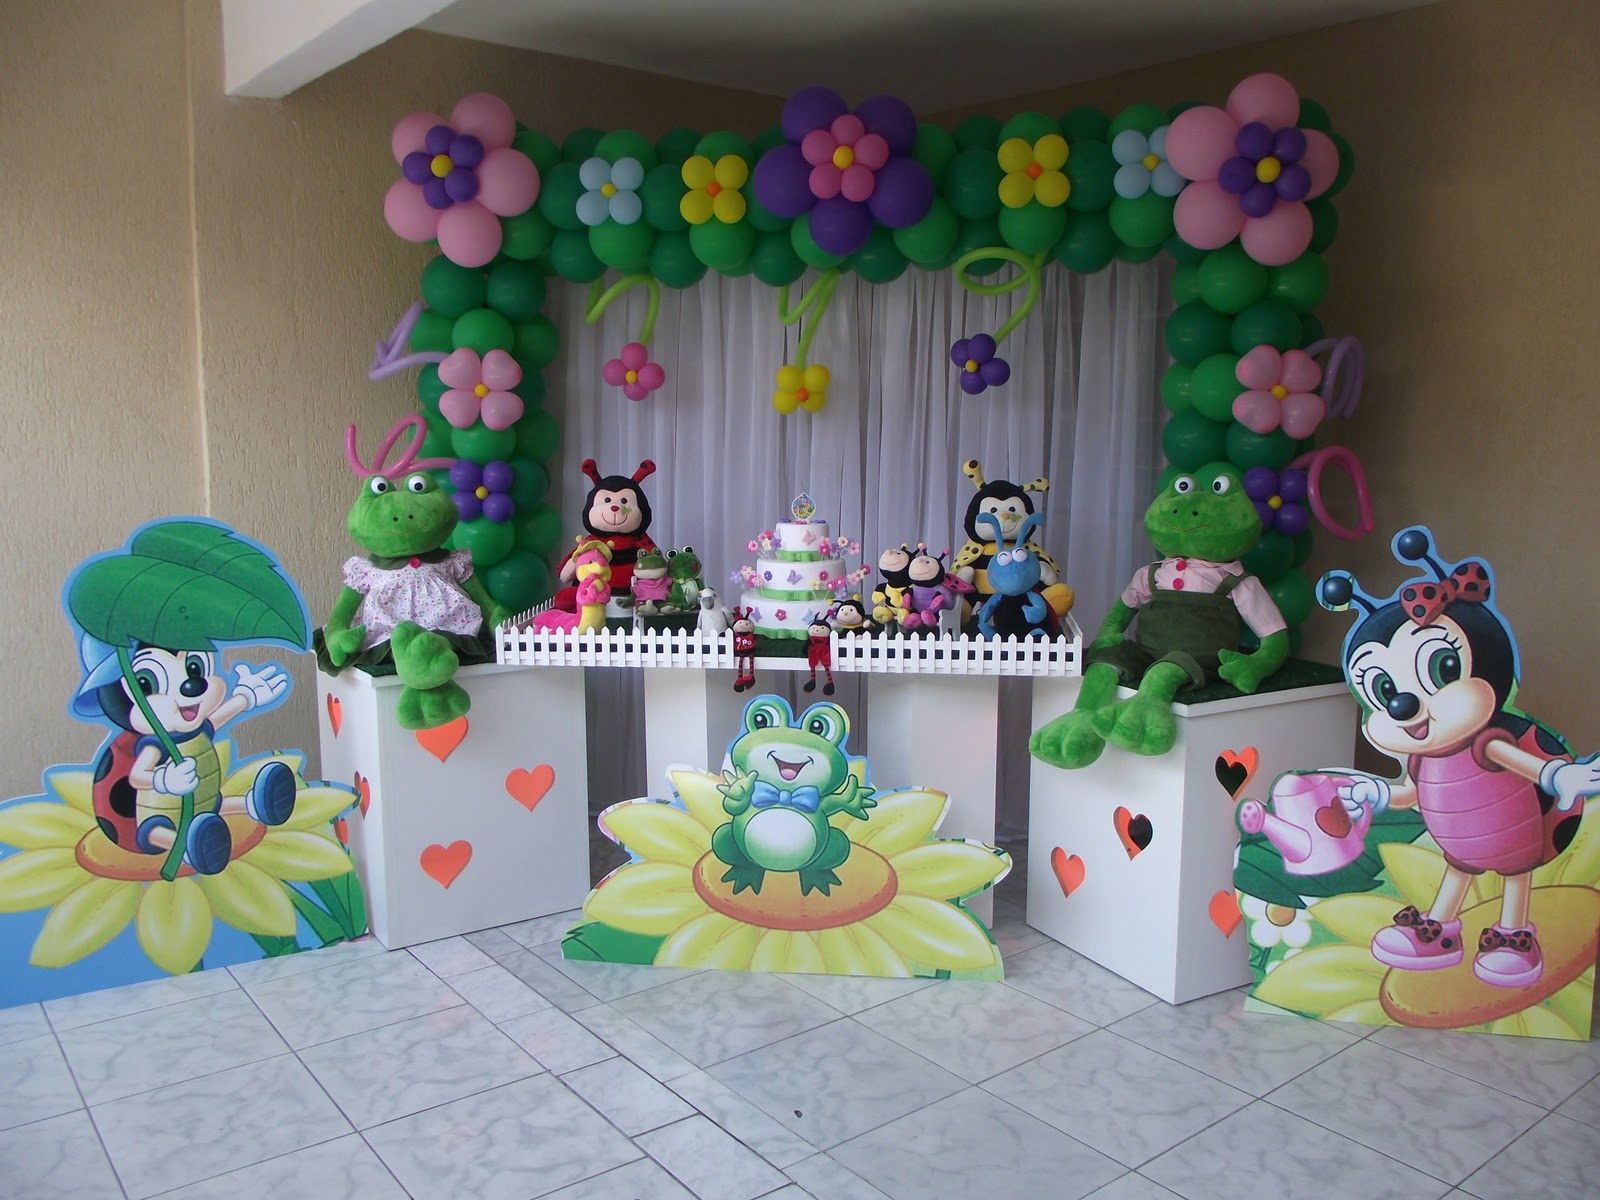 enfeites para festa infantil tema jardim : enfeites para festa infantil tema jardim:Decoração Provençal Festa infantil Quebra Galho Festas.